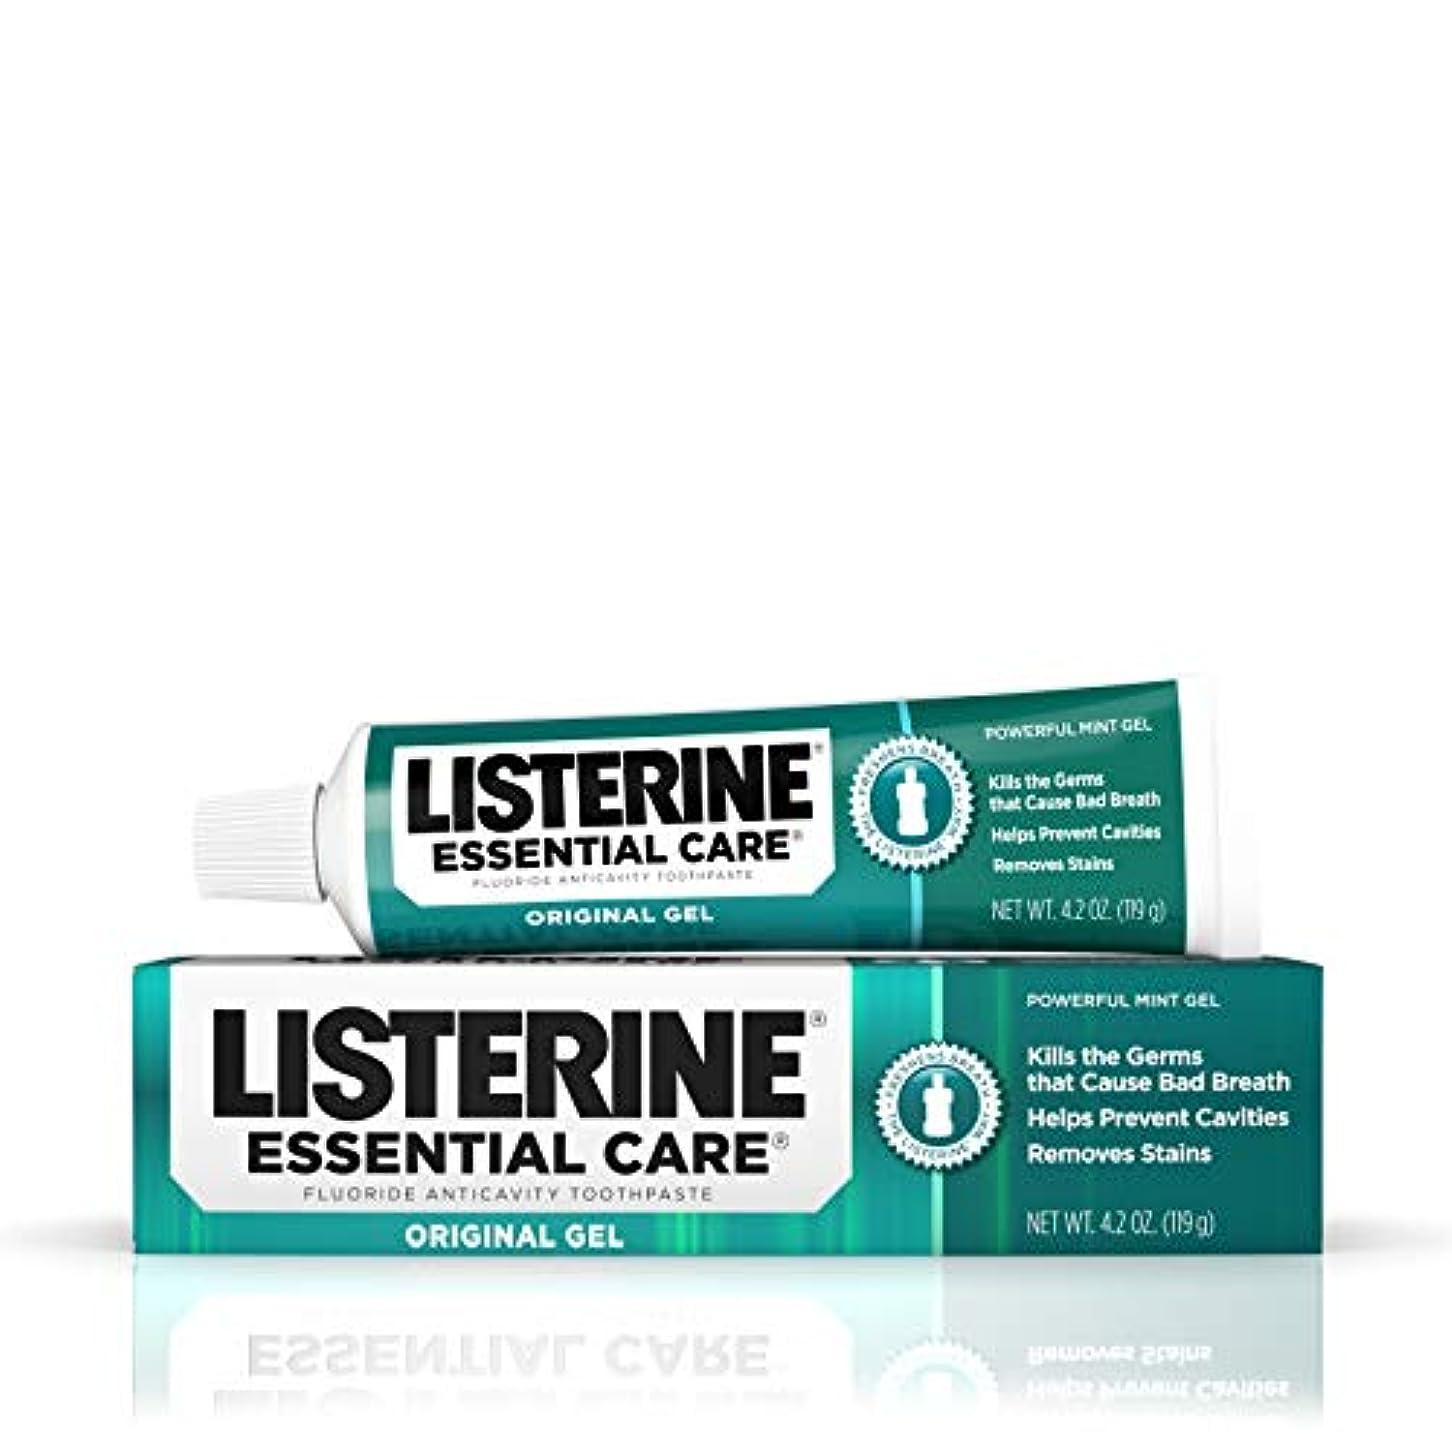 有望リスト彼女自身海外直送品Listerine Essential Care Toothpaste Gel Original, Powerful Mint 4.2 oz by Listerine